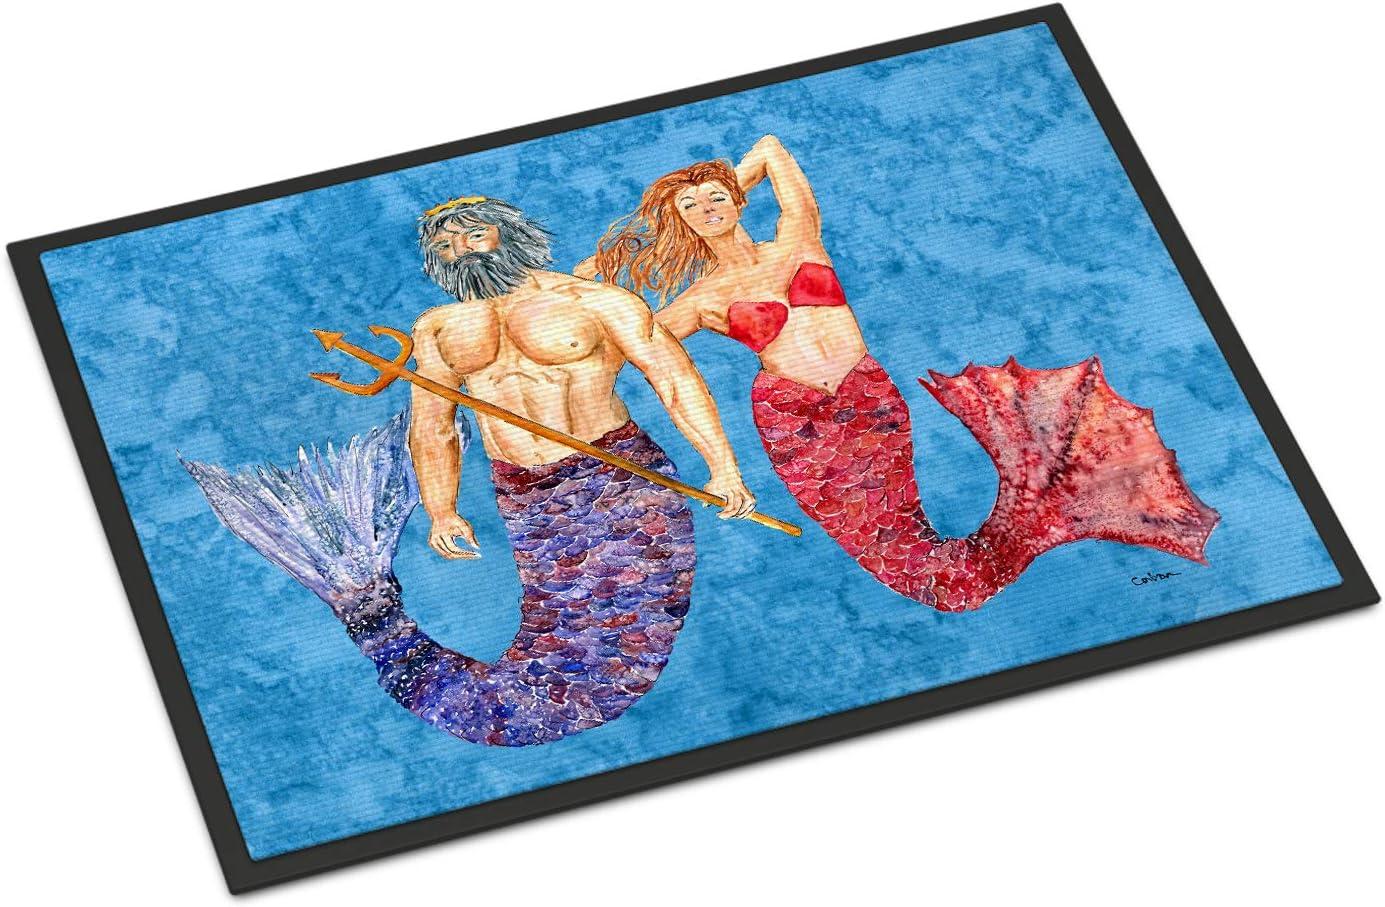 Caroline s Treasures 8801JMAT Mermaid and Merman Indoor or Outdoor Mat 24×36, 24H X 36W, Multicolor